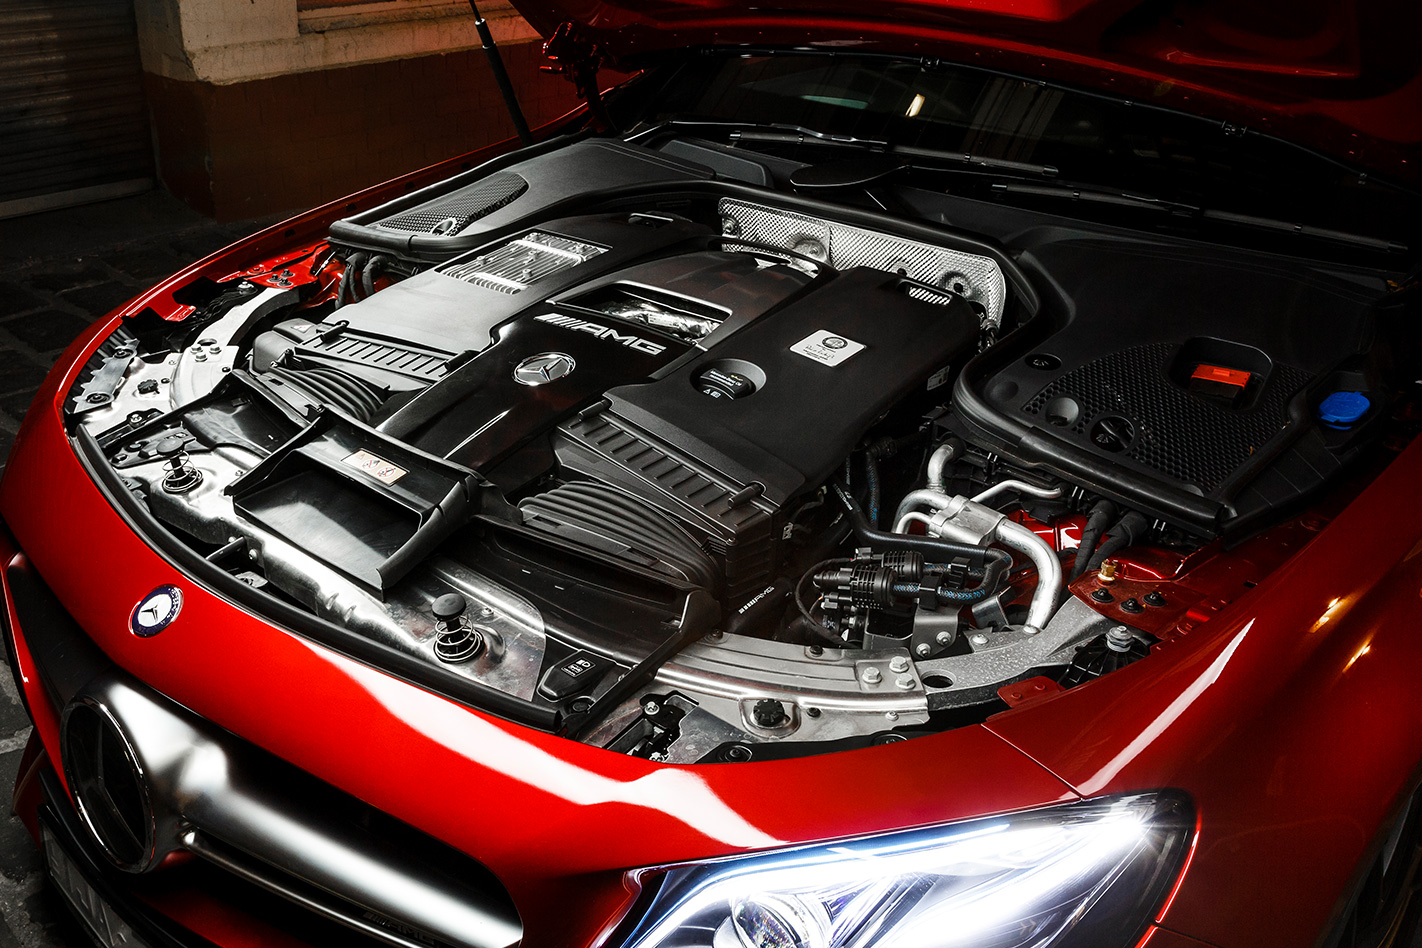 2017 MercedesAMG E63 S engine